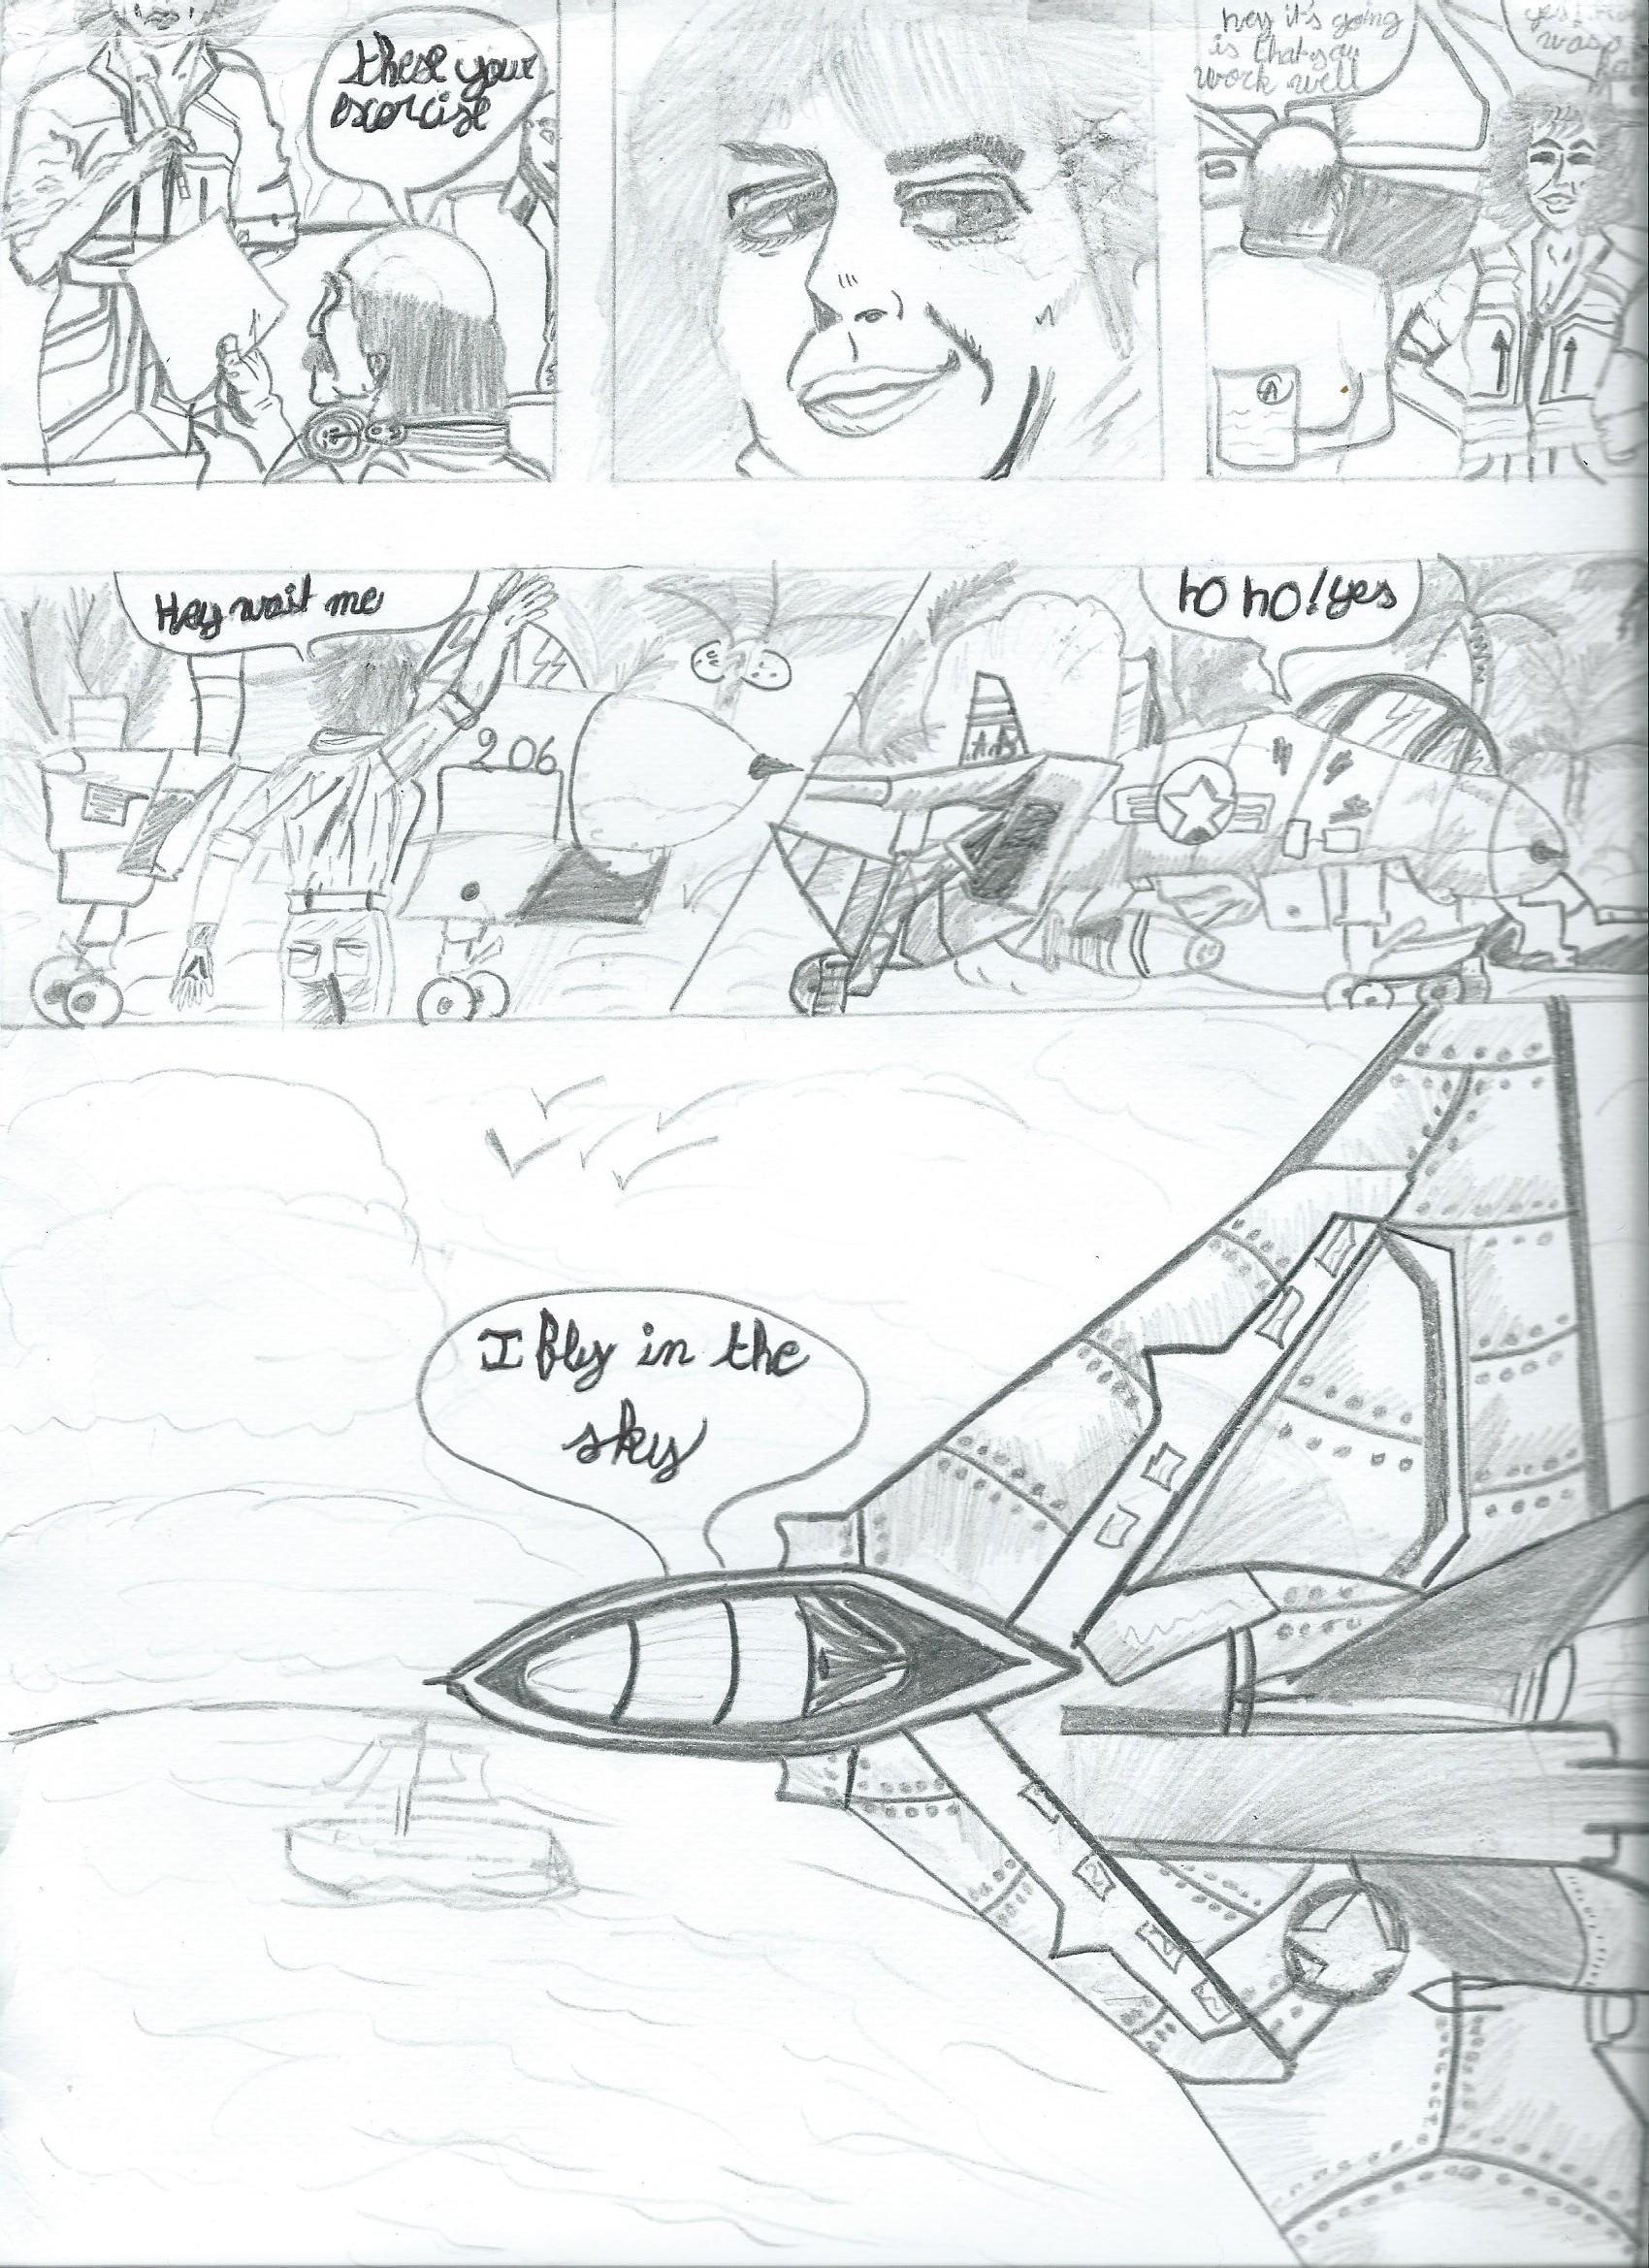 Ibtissam-comics-planes